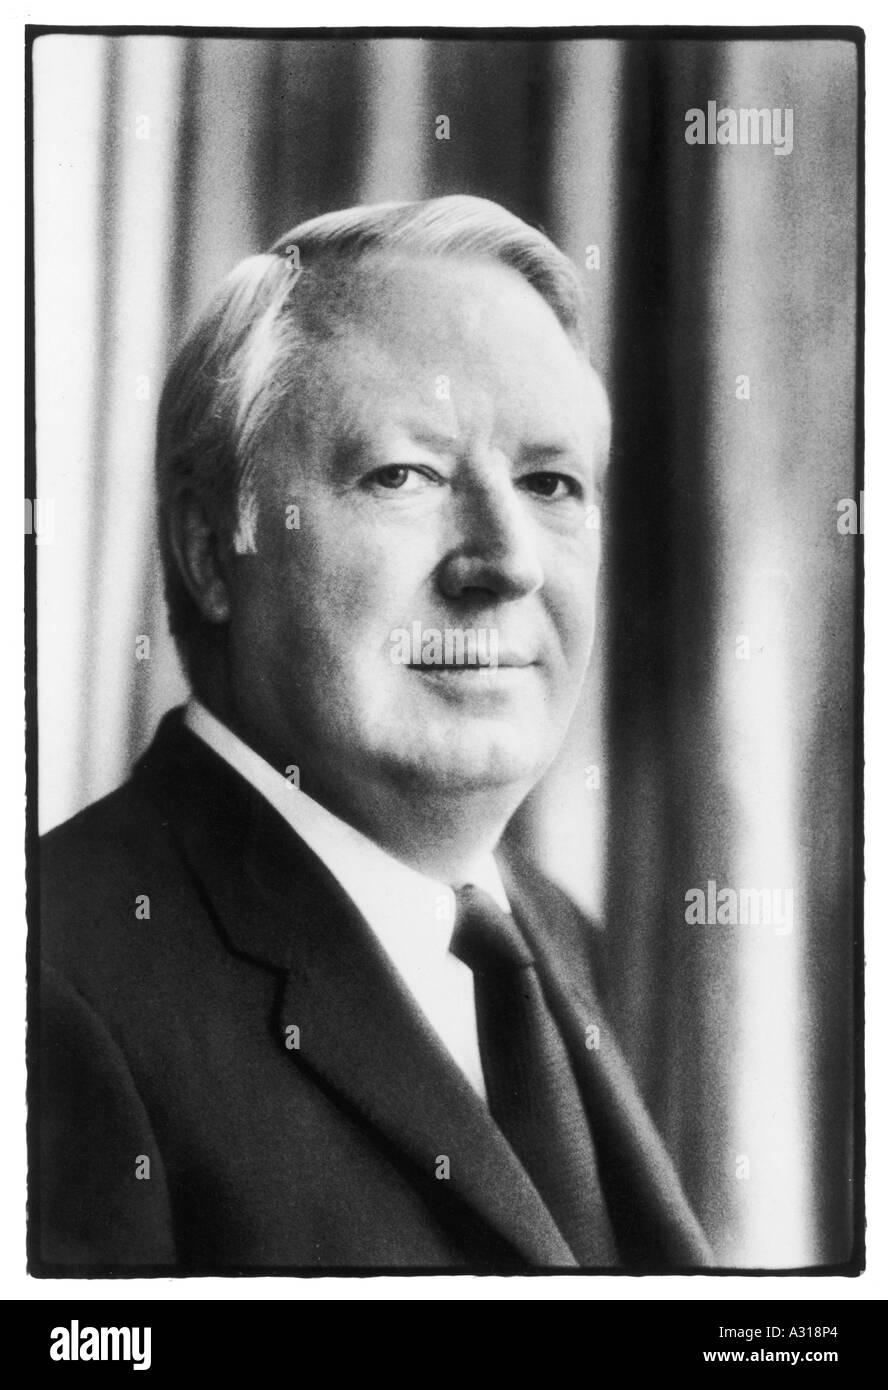 Edward Heath Photograph Stock Photo